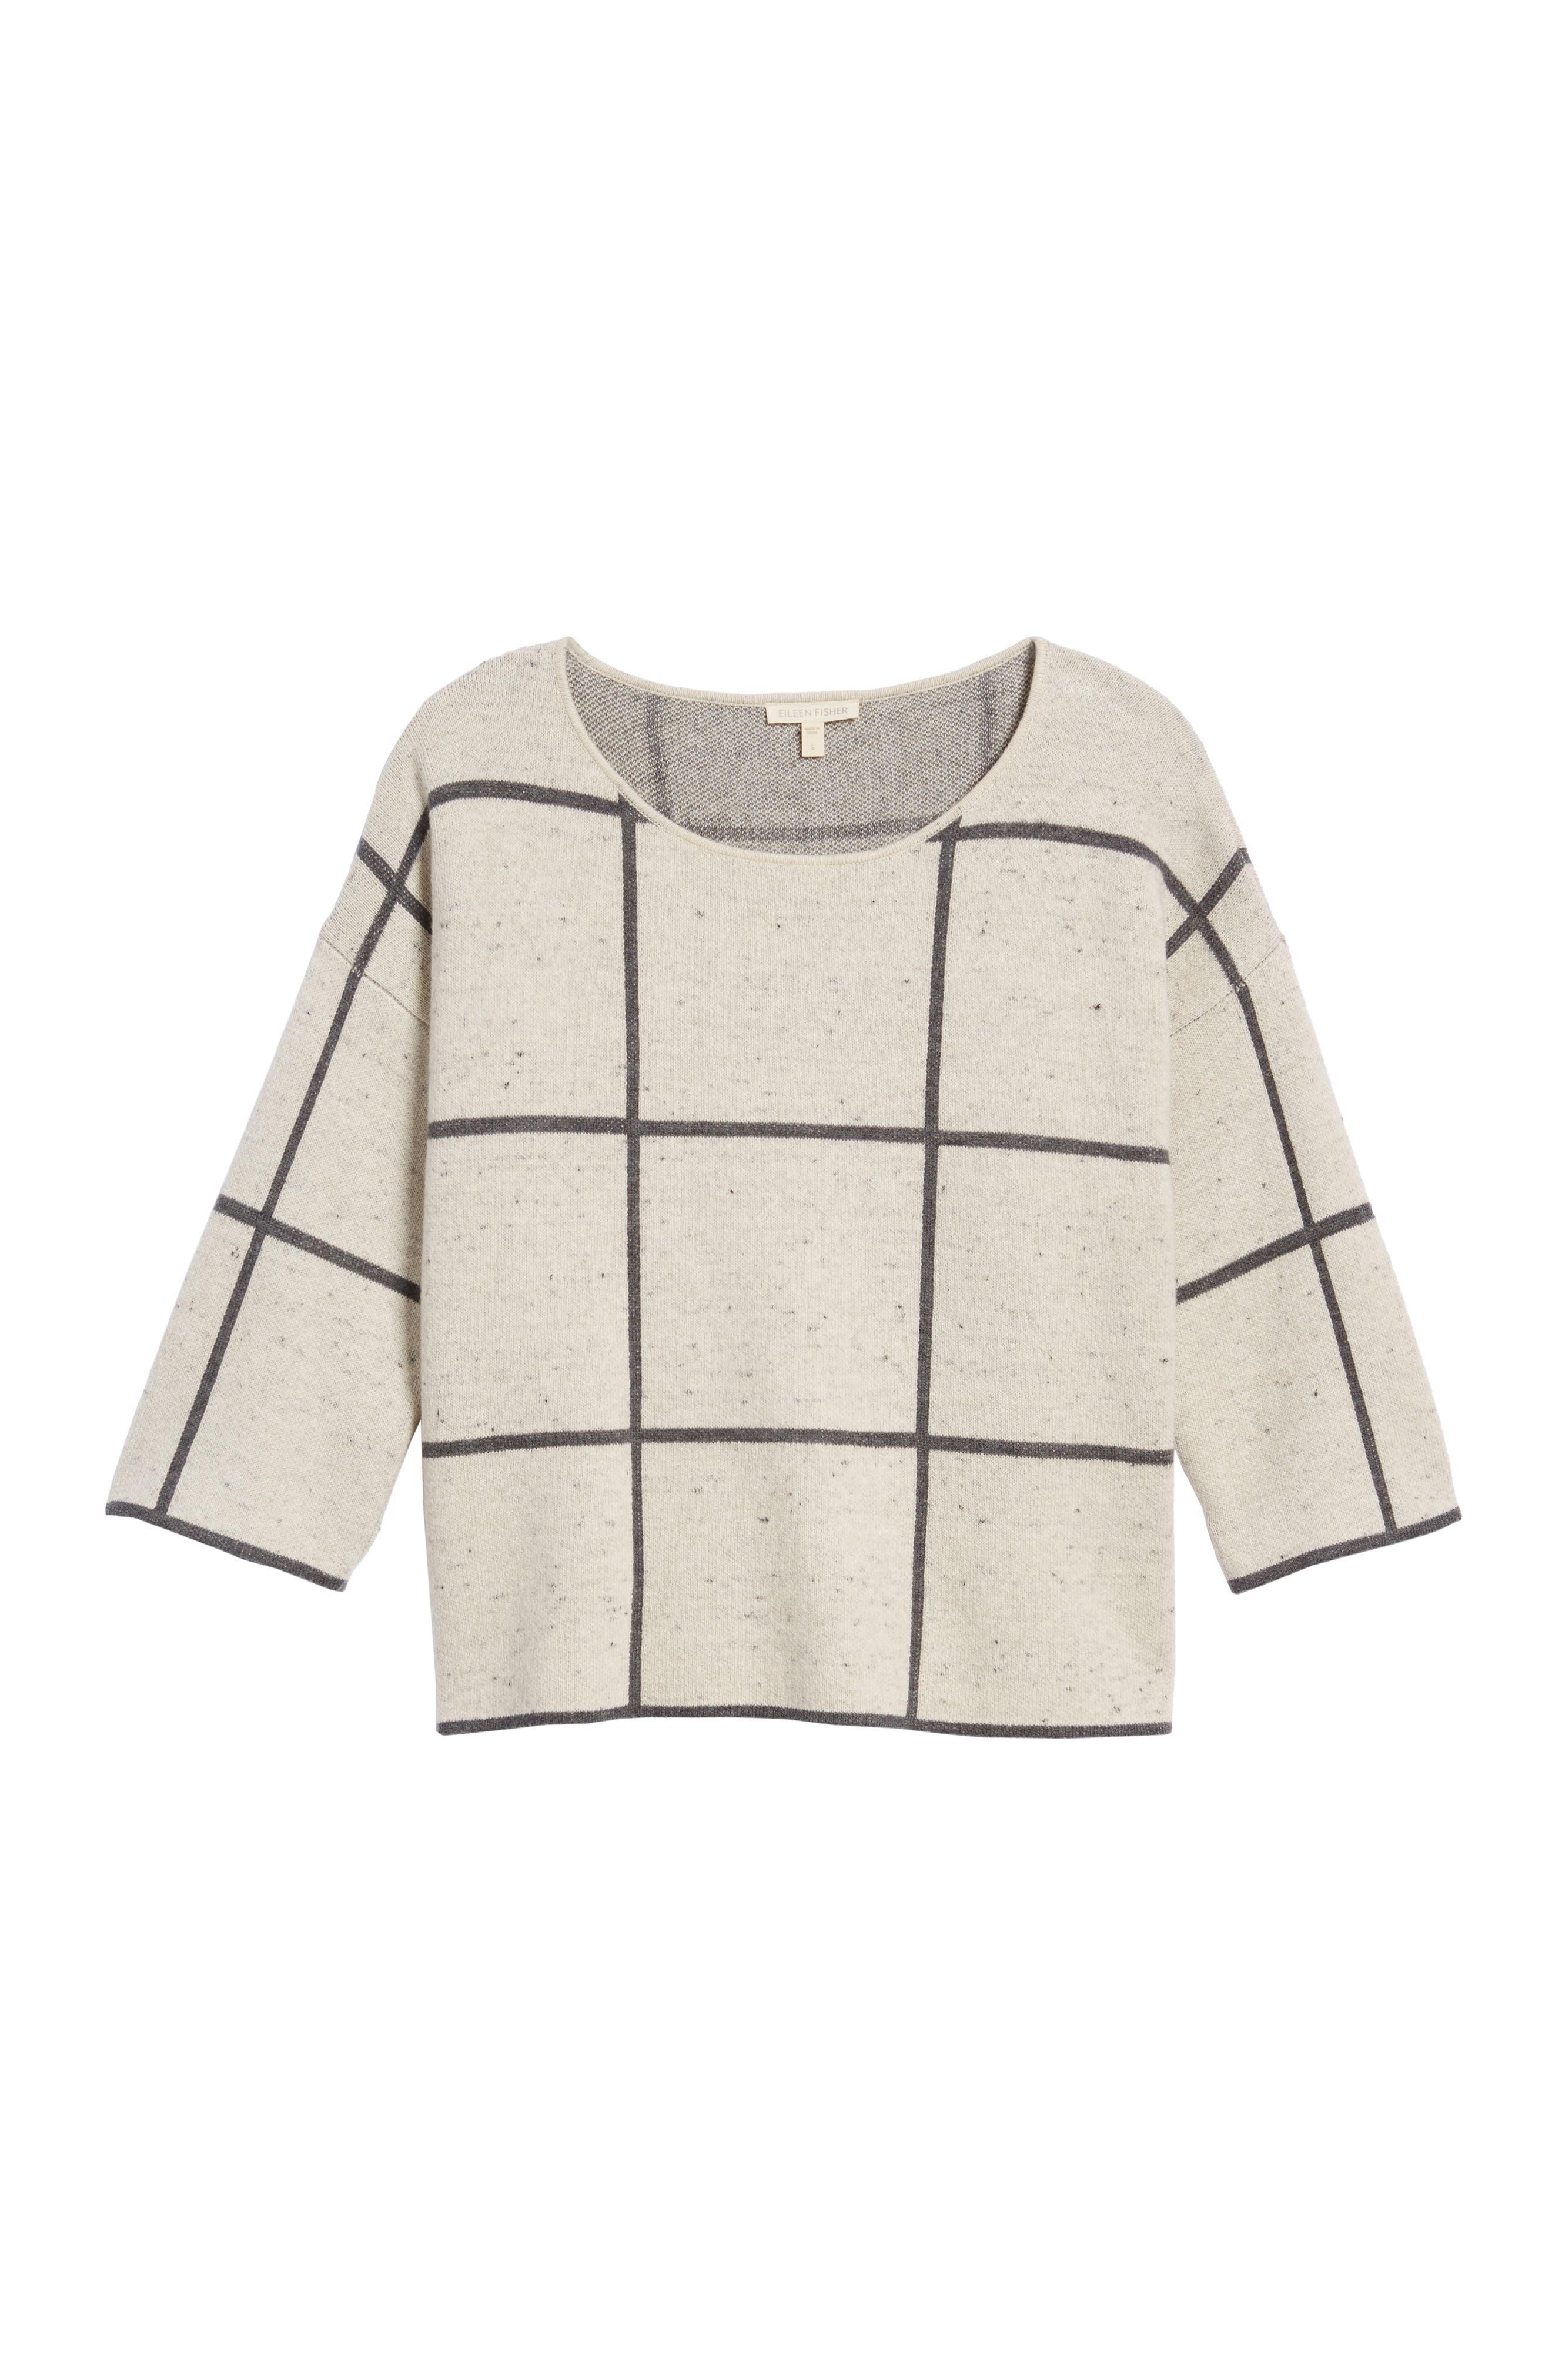 Windowpane Check Boxy Sweater,                             Alternate thumbnail 6, color,                             264